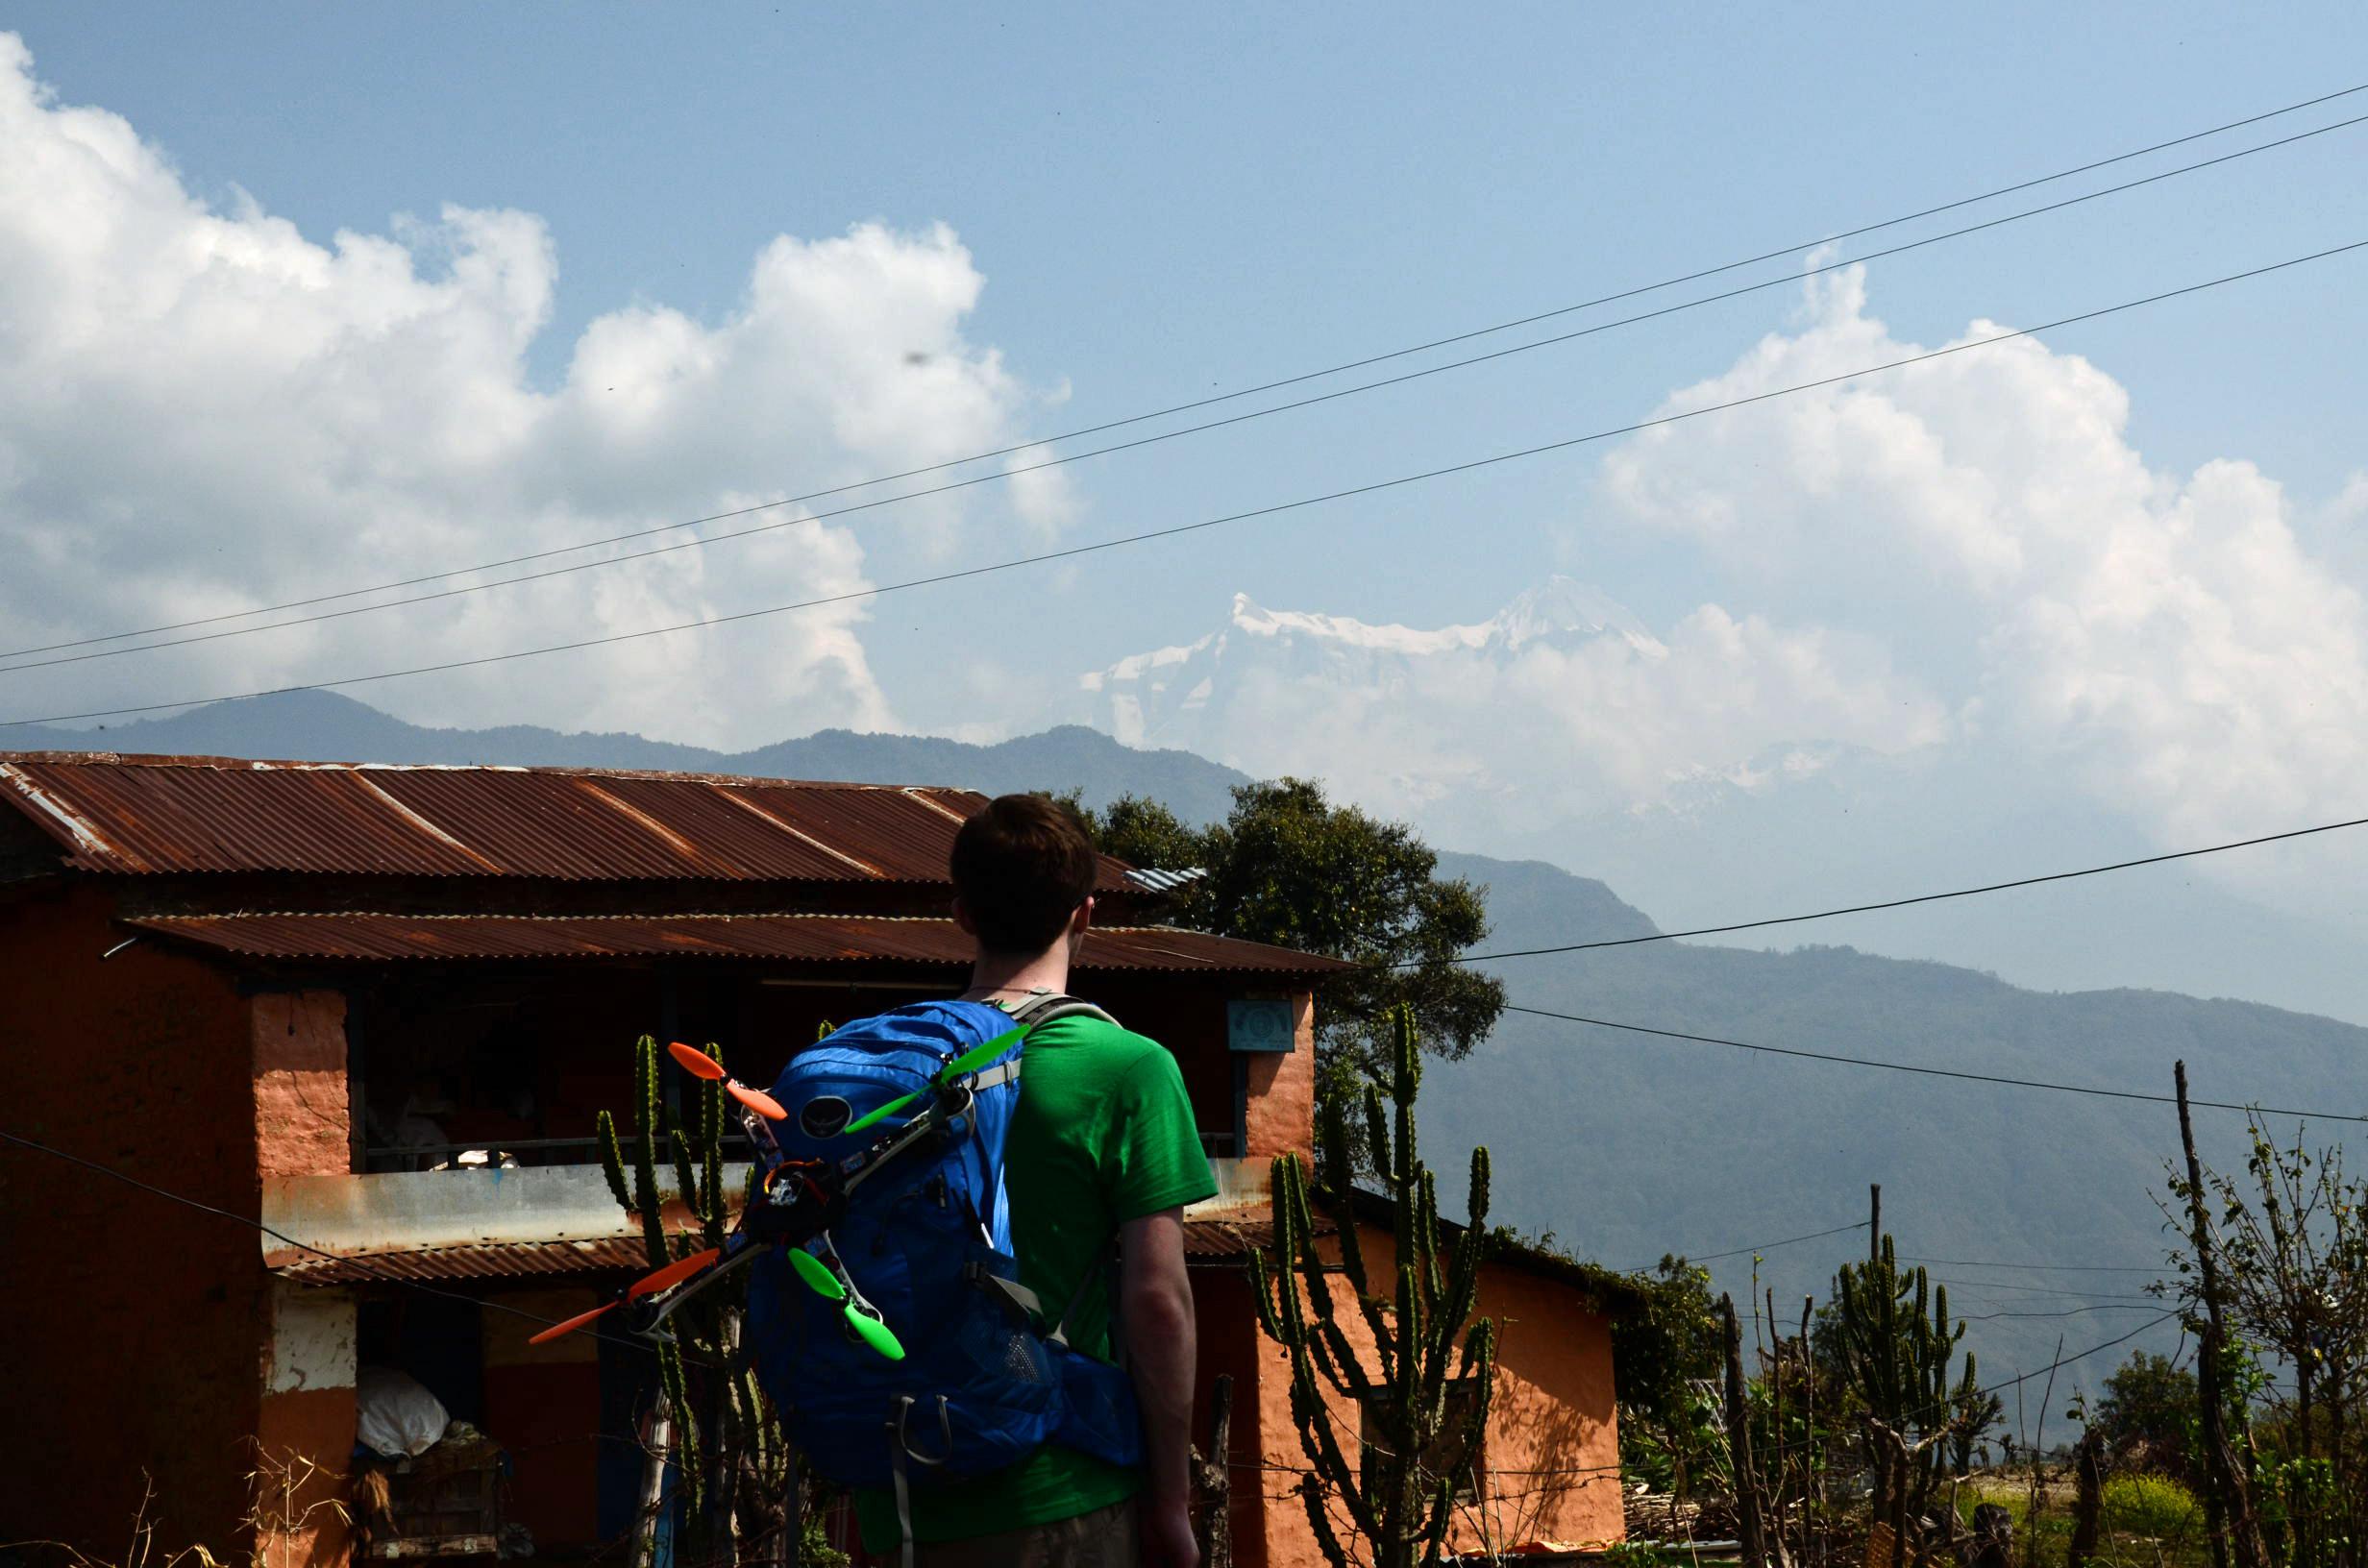 mck-3-23-15-mck-drone-village-rising-storm-over-annapurna-rangebDSC_1522.jpg